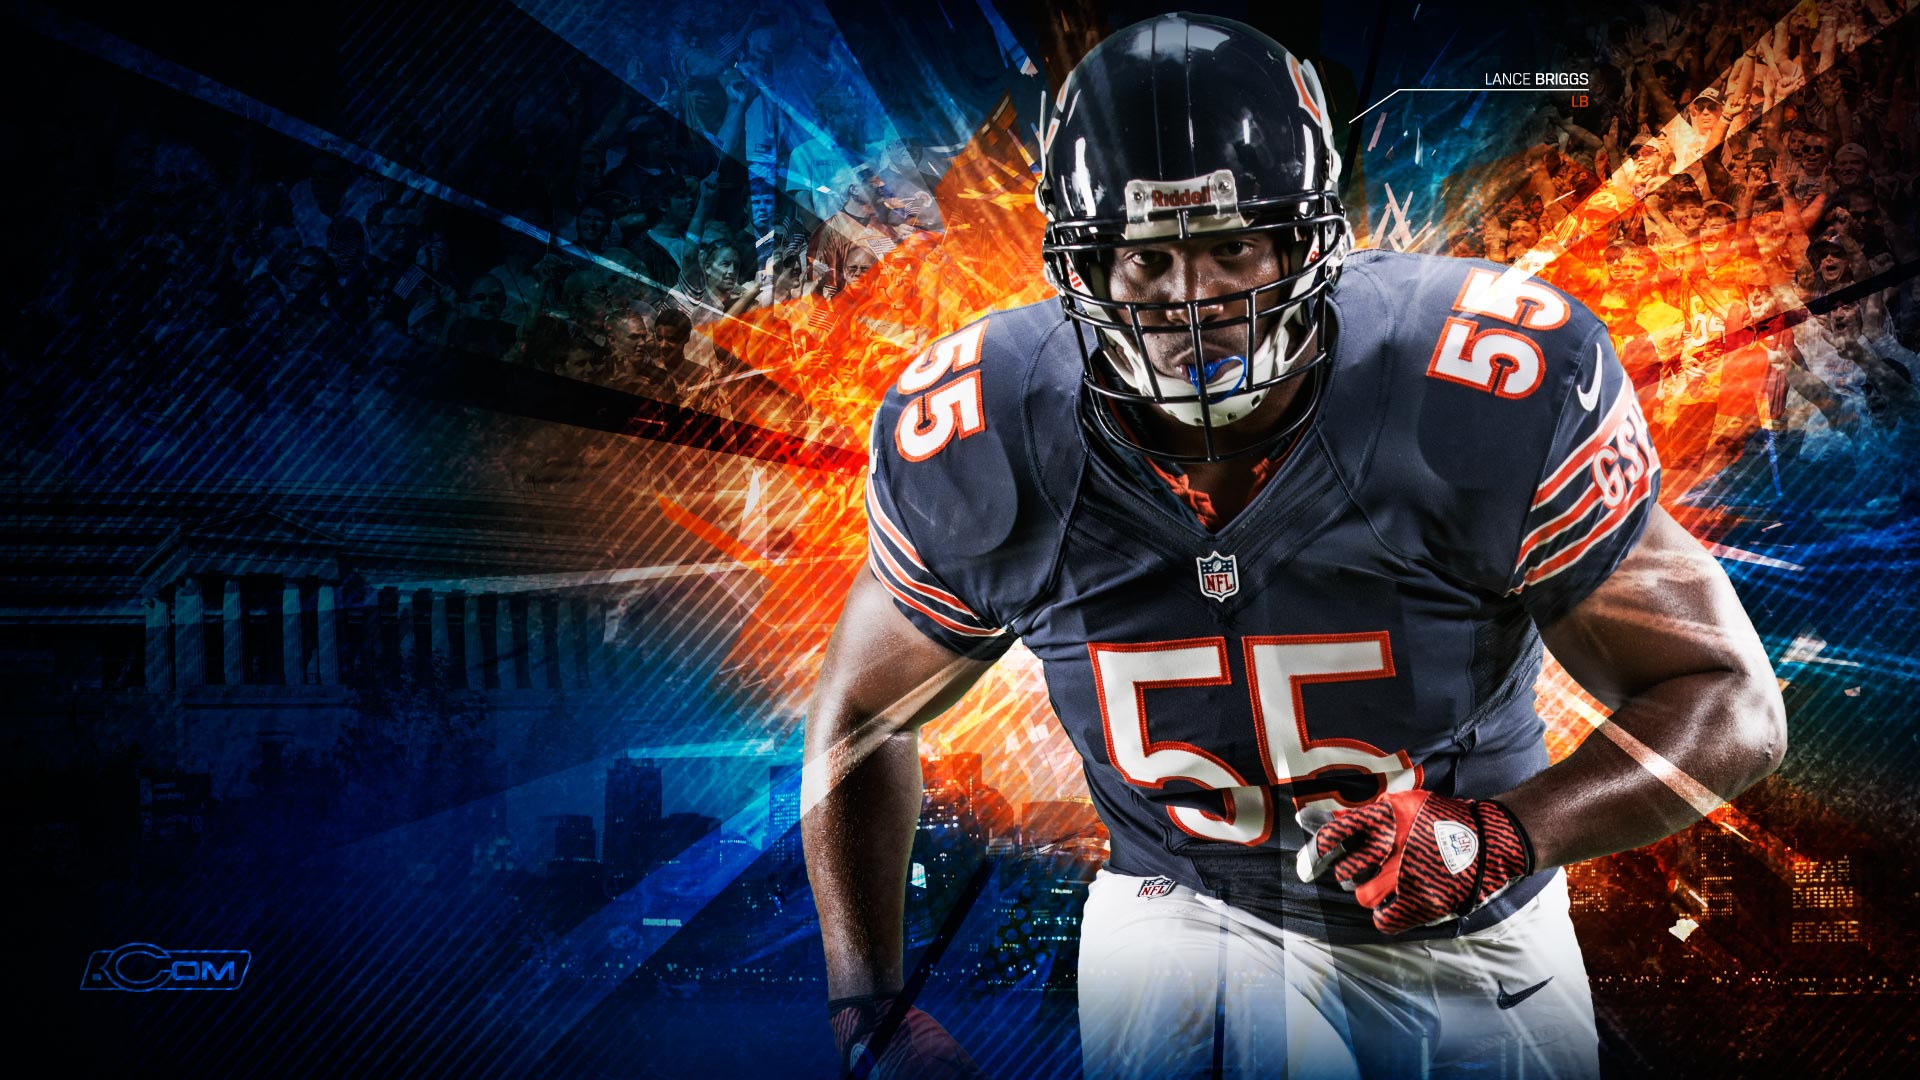 Chicago Bears 2012 wallpaper 1920x1080